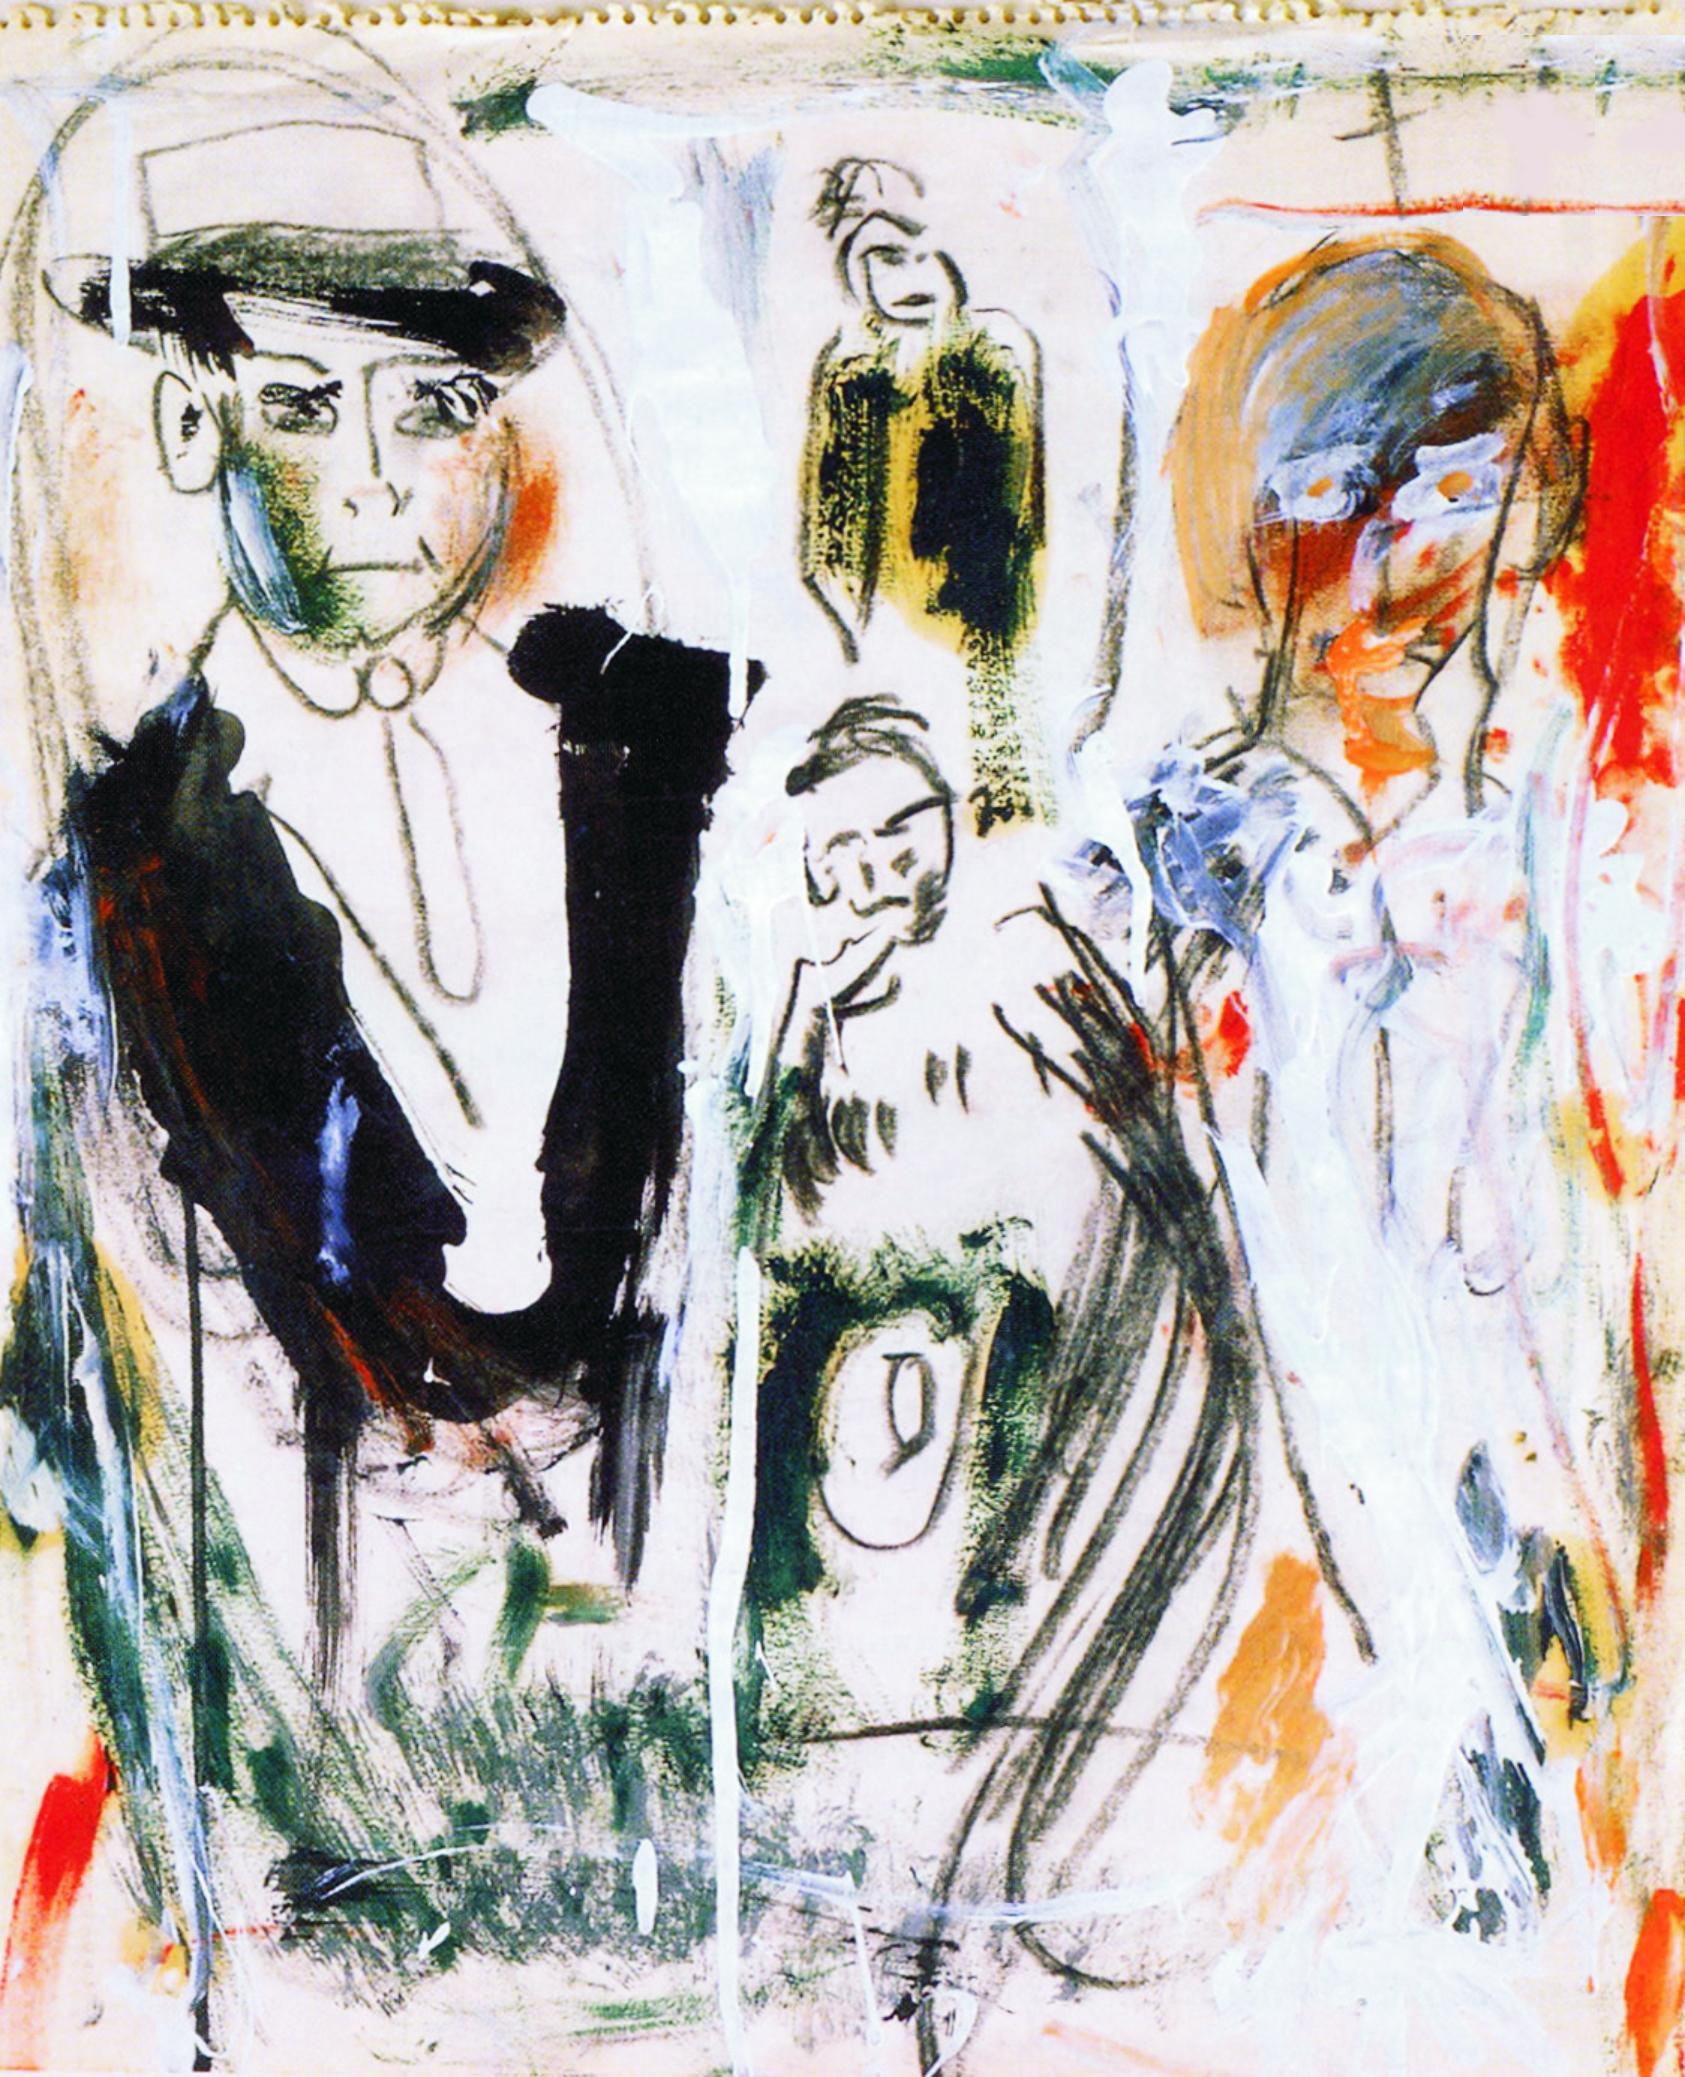 Pintura de Jack Kerouac